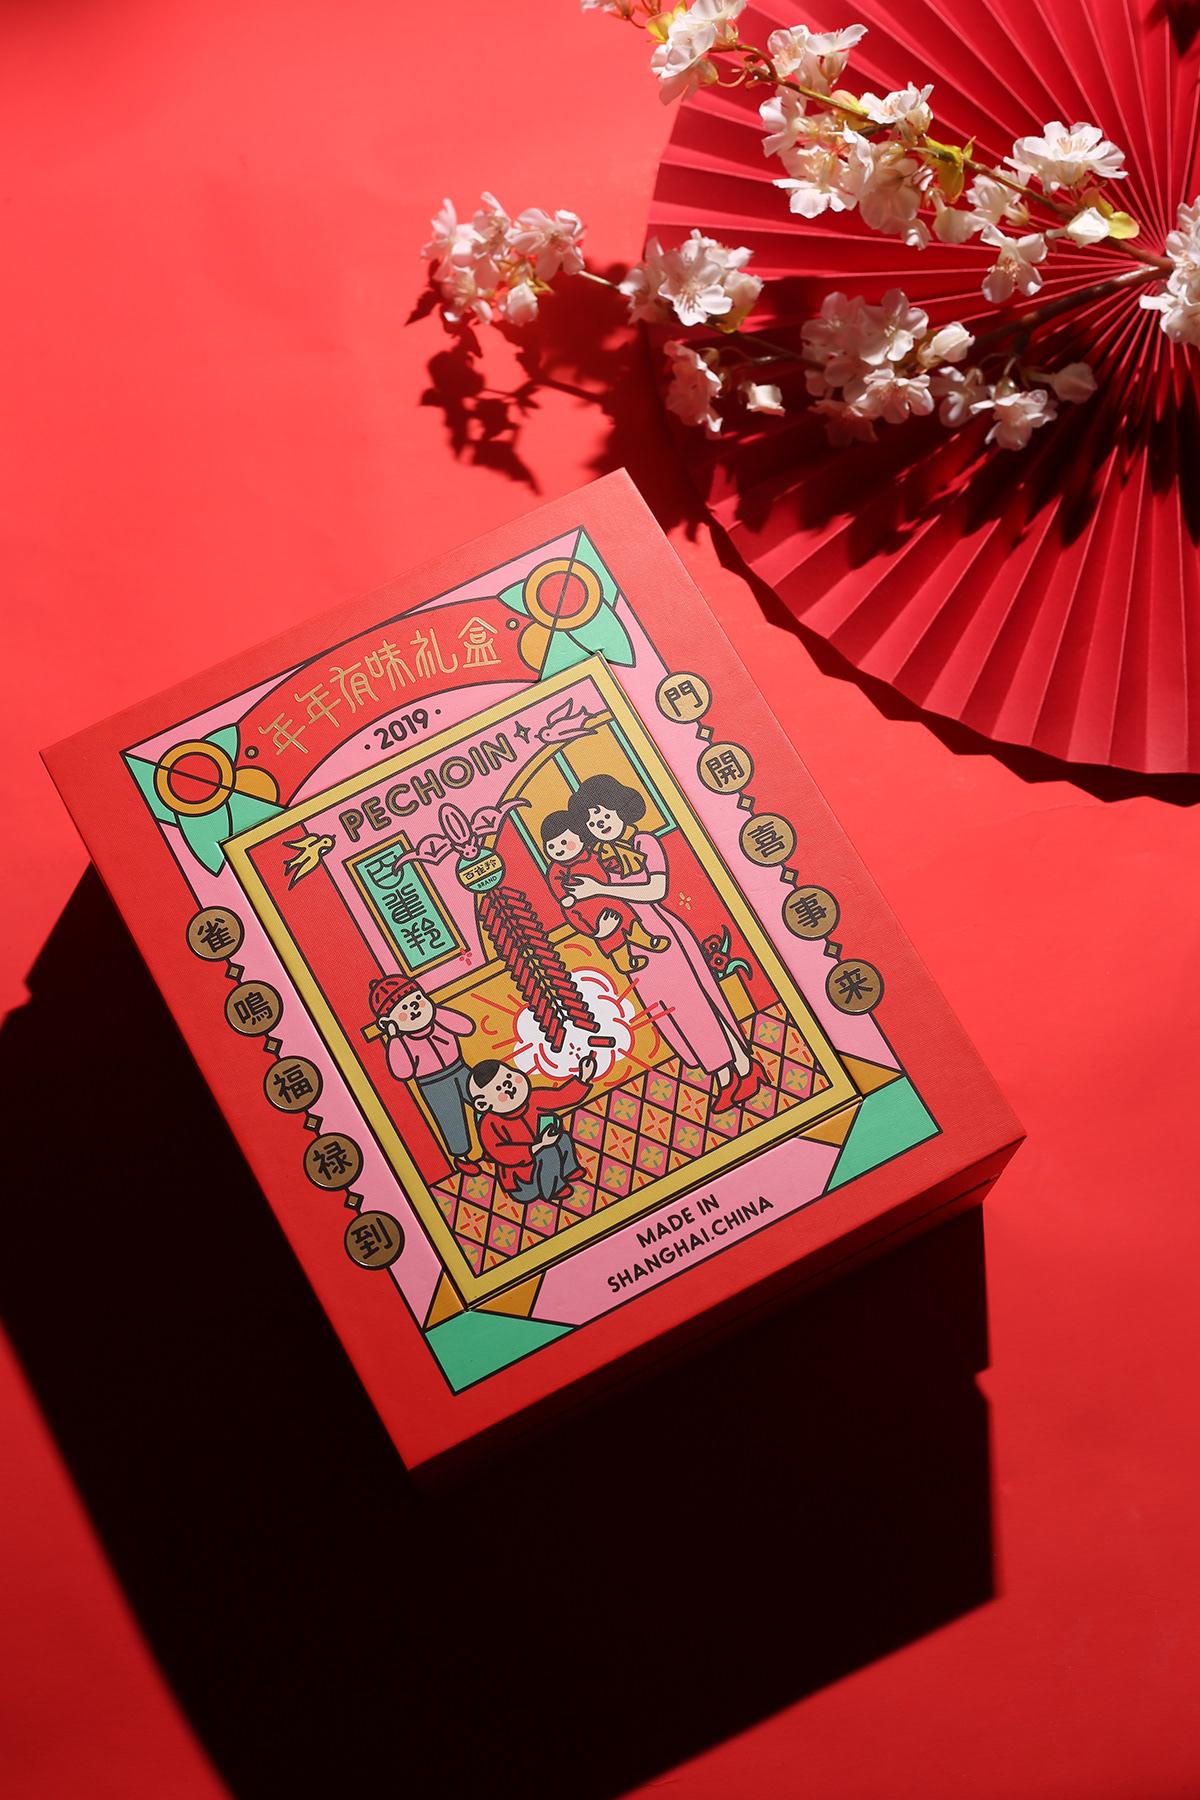 『PECHOIN×Make Happy Company』New year gift box on Behance